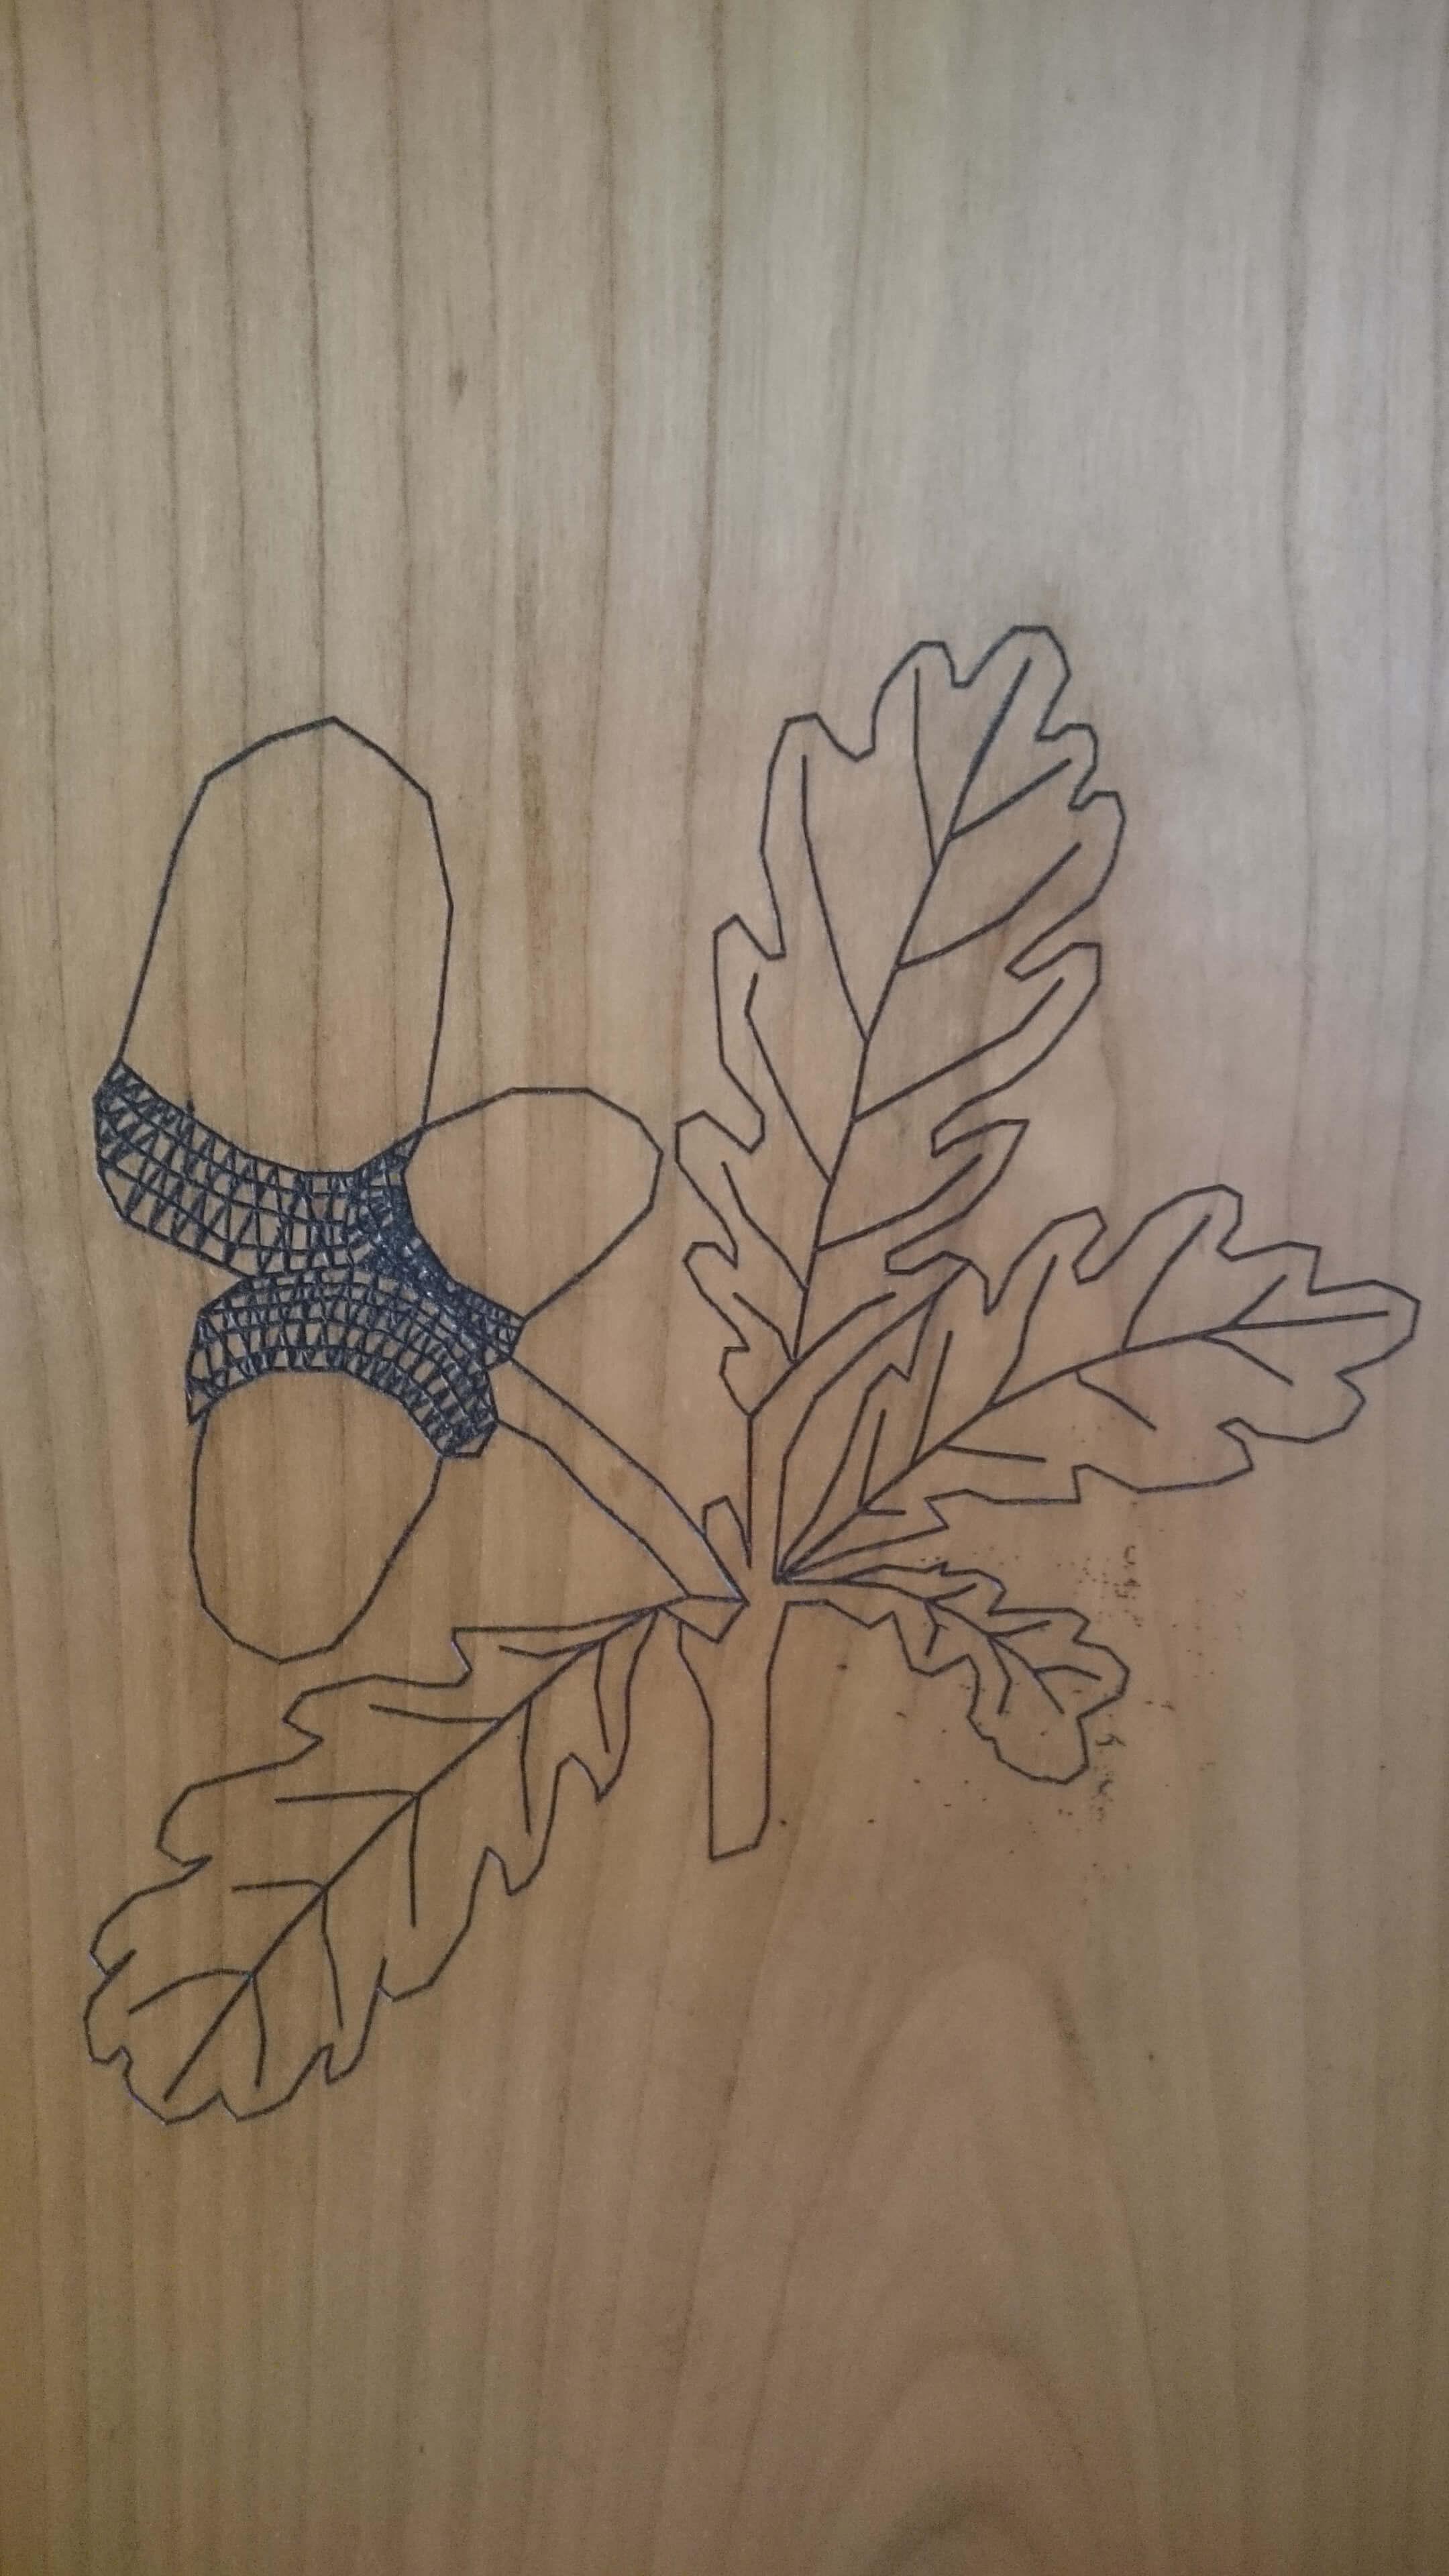 Menuiserie Figard - Fabrication sur mesure - Gravure - Merisier patiné - Vesoul